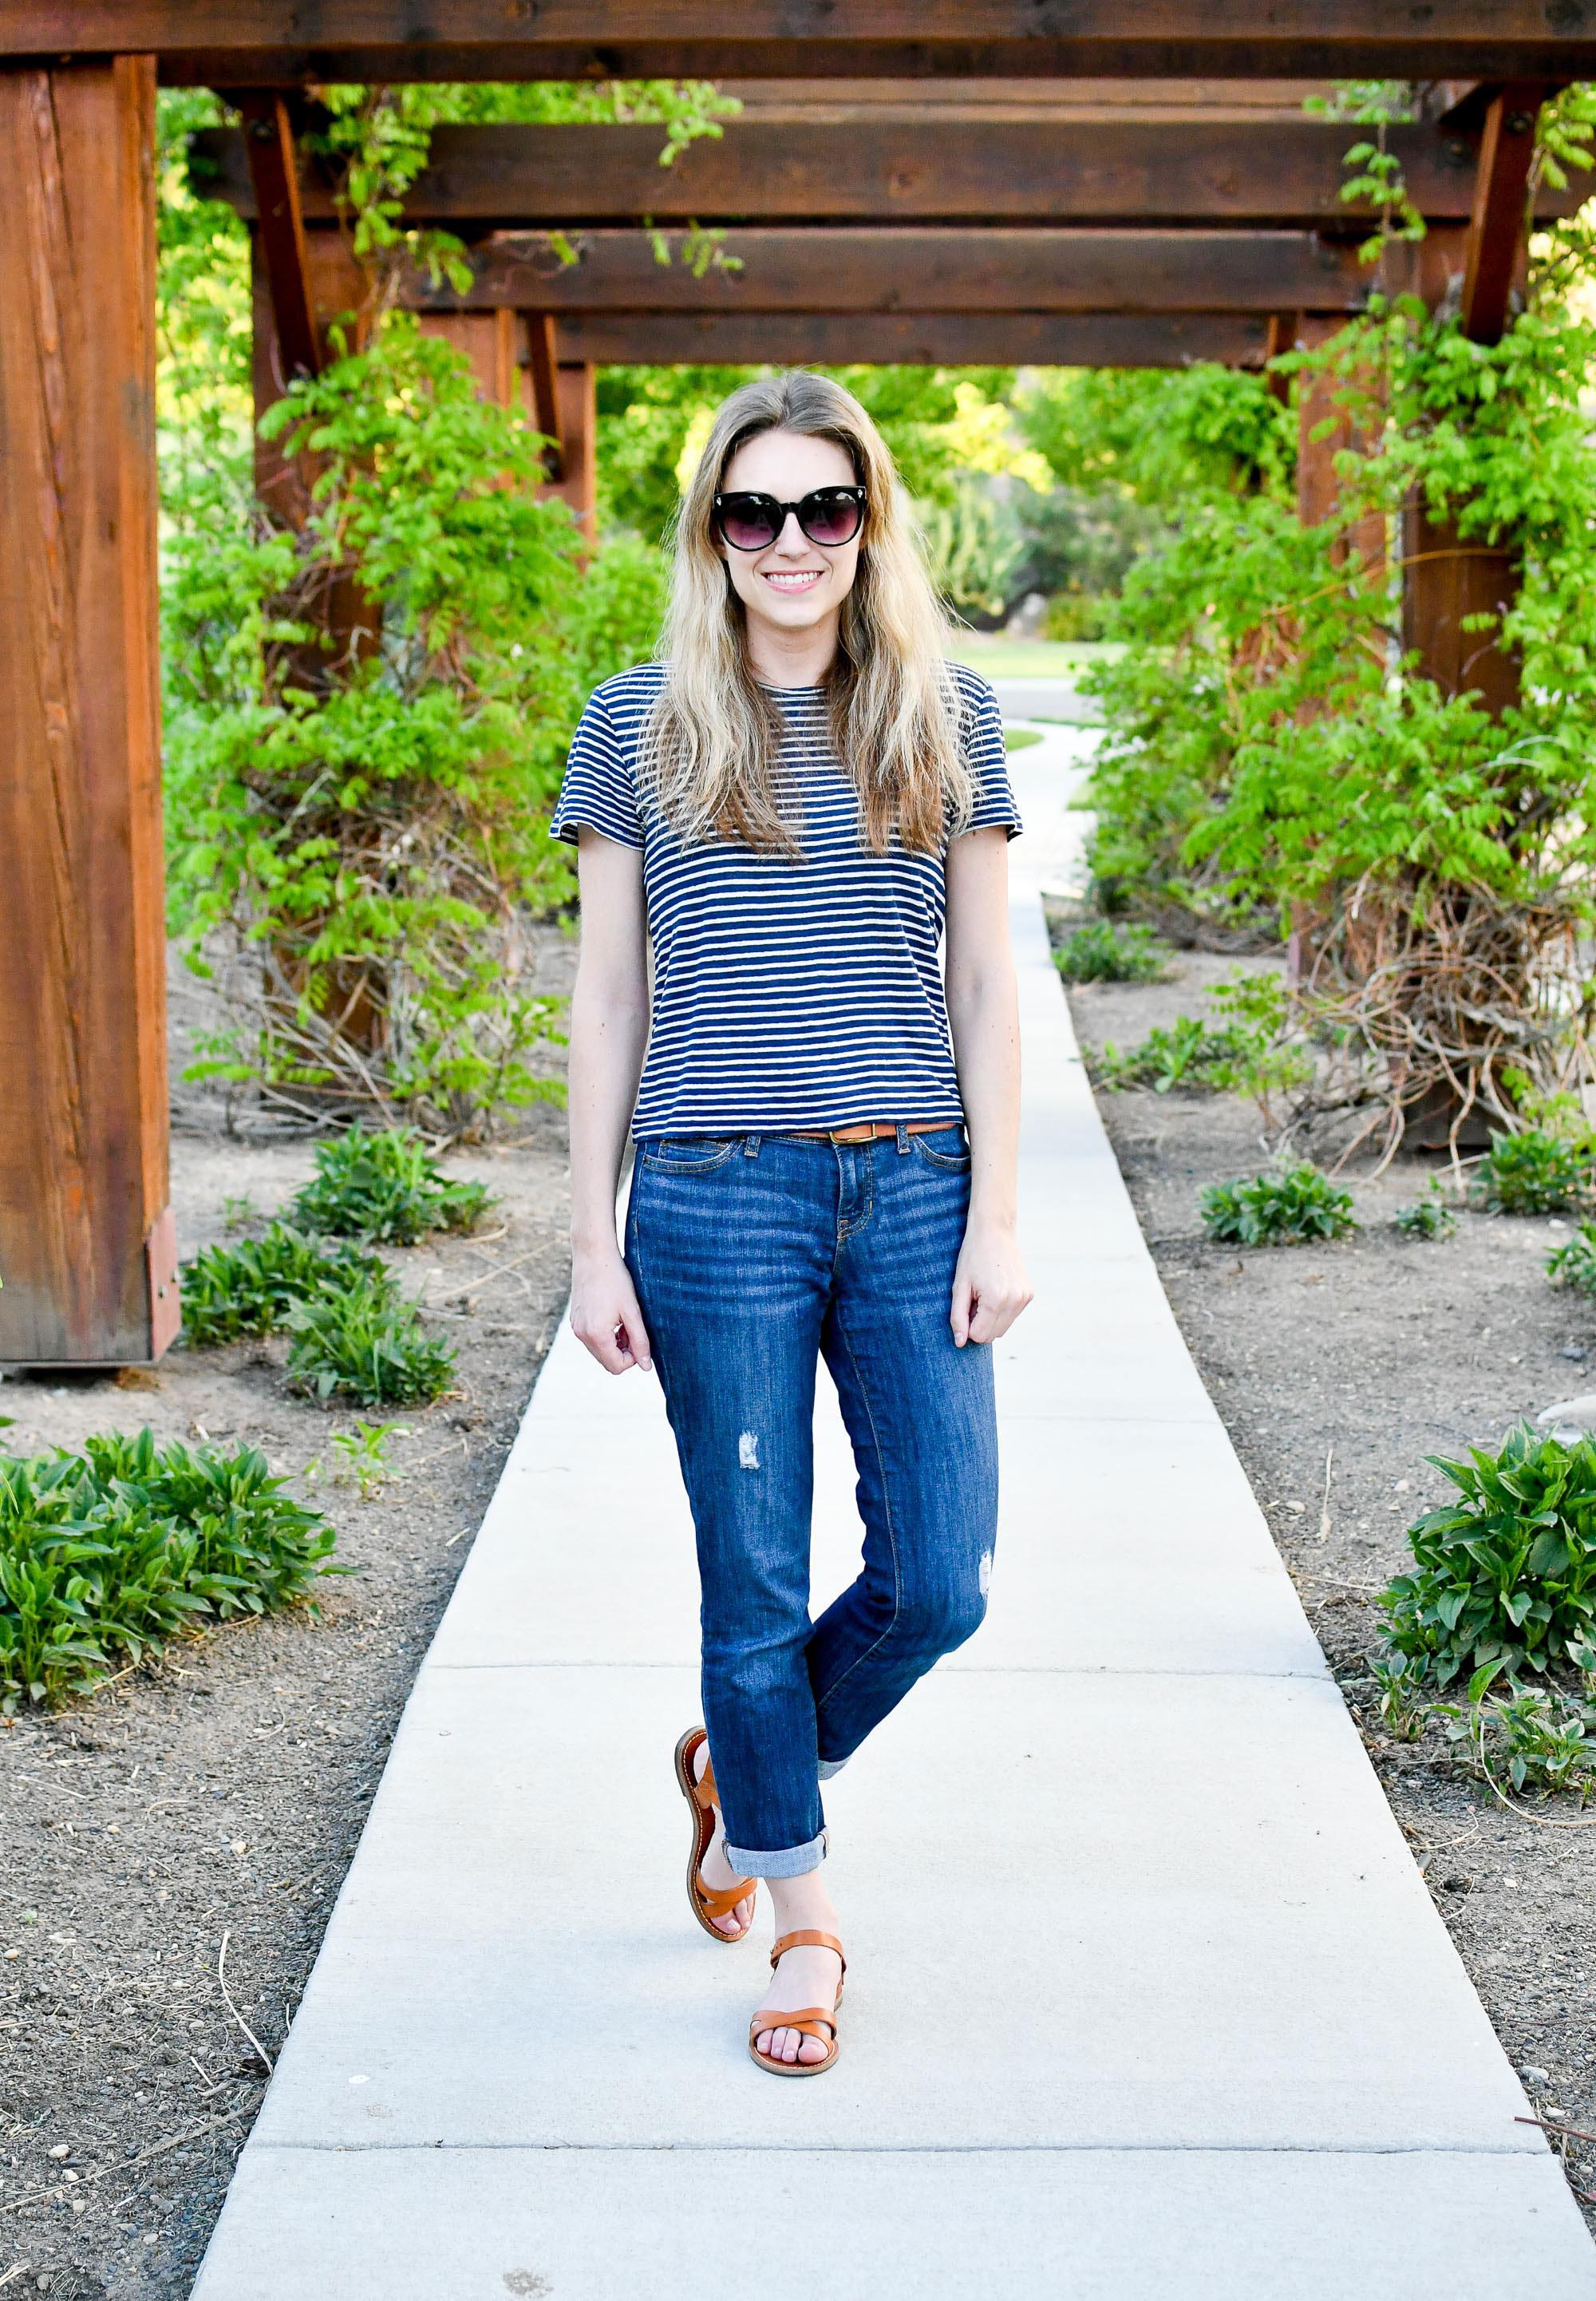 Boyfriend jeans outfit with sandals — Cotton Cashmere Cat Hair